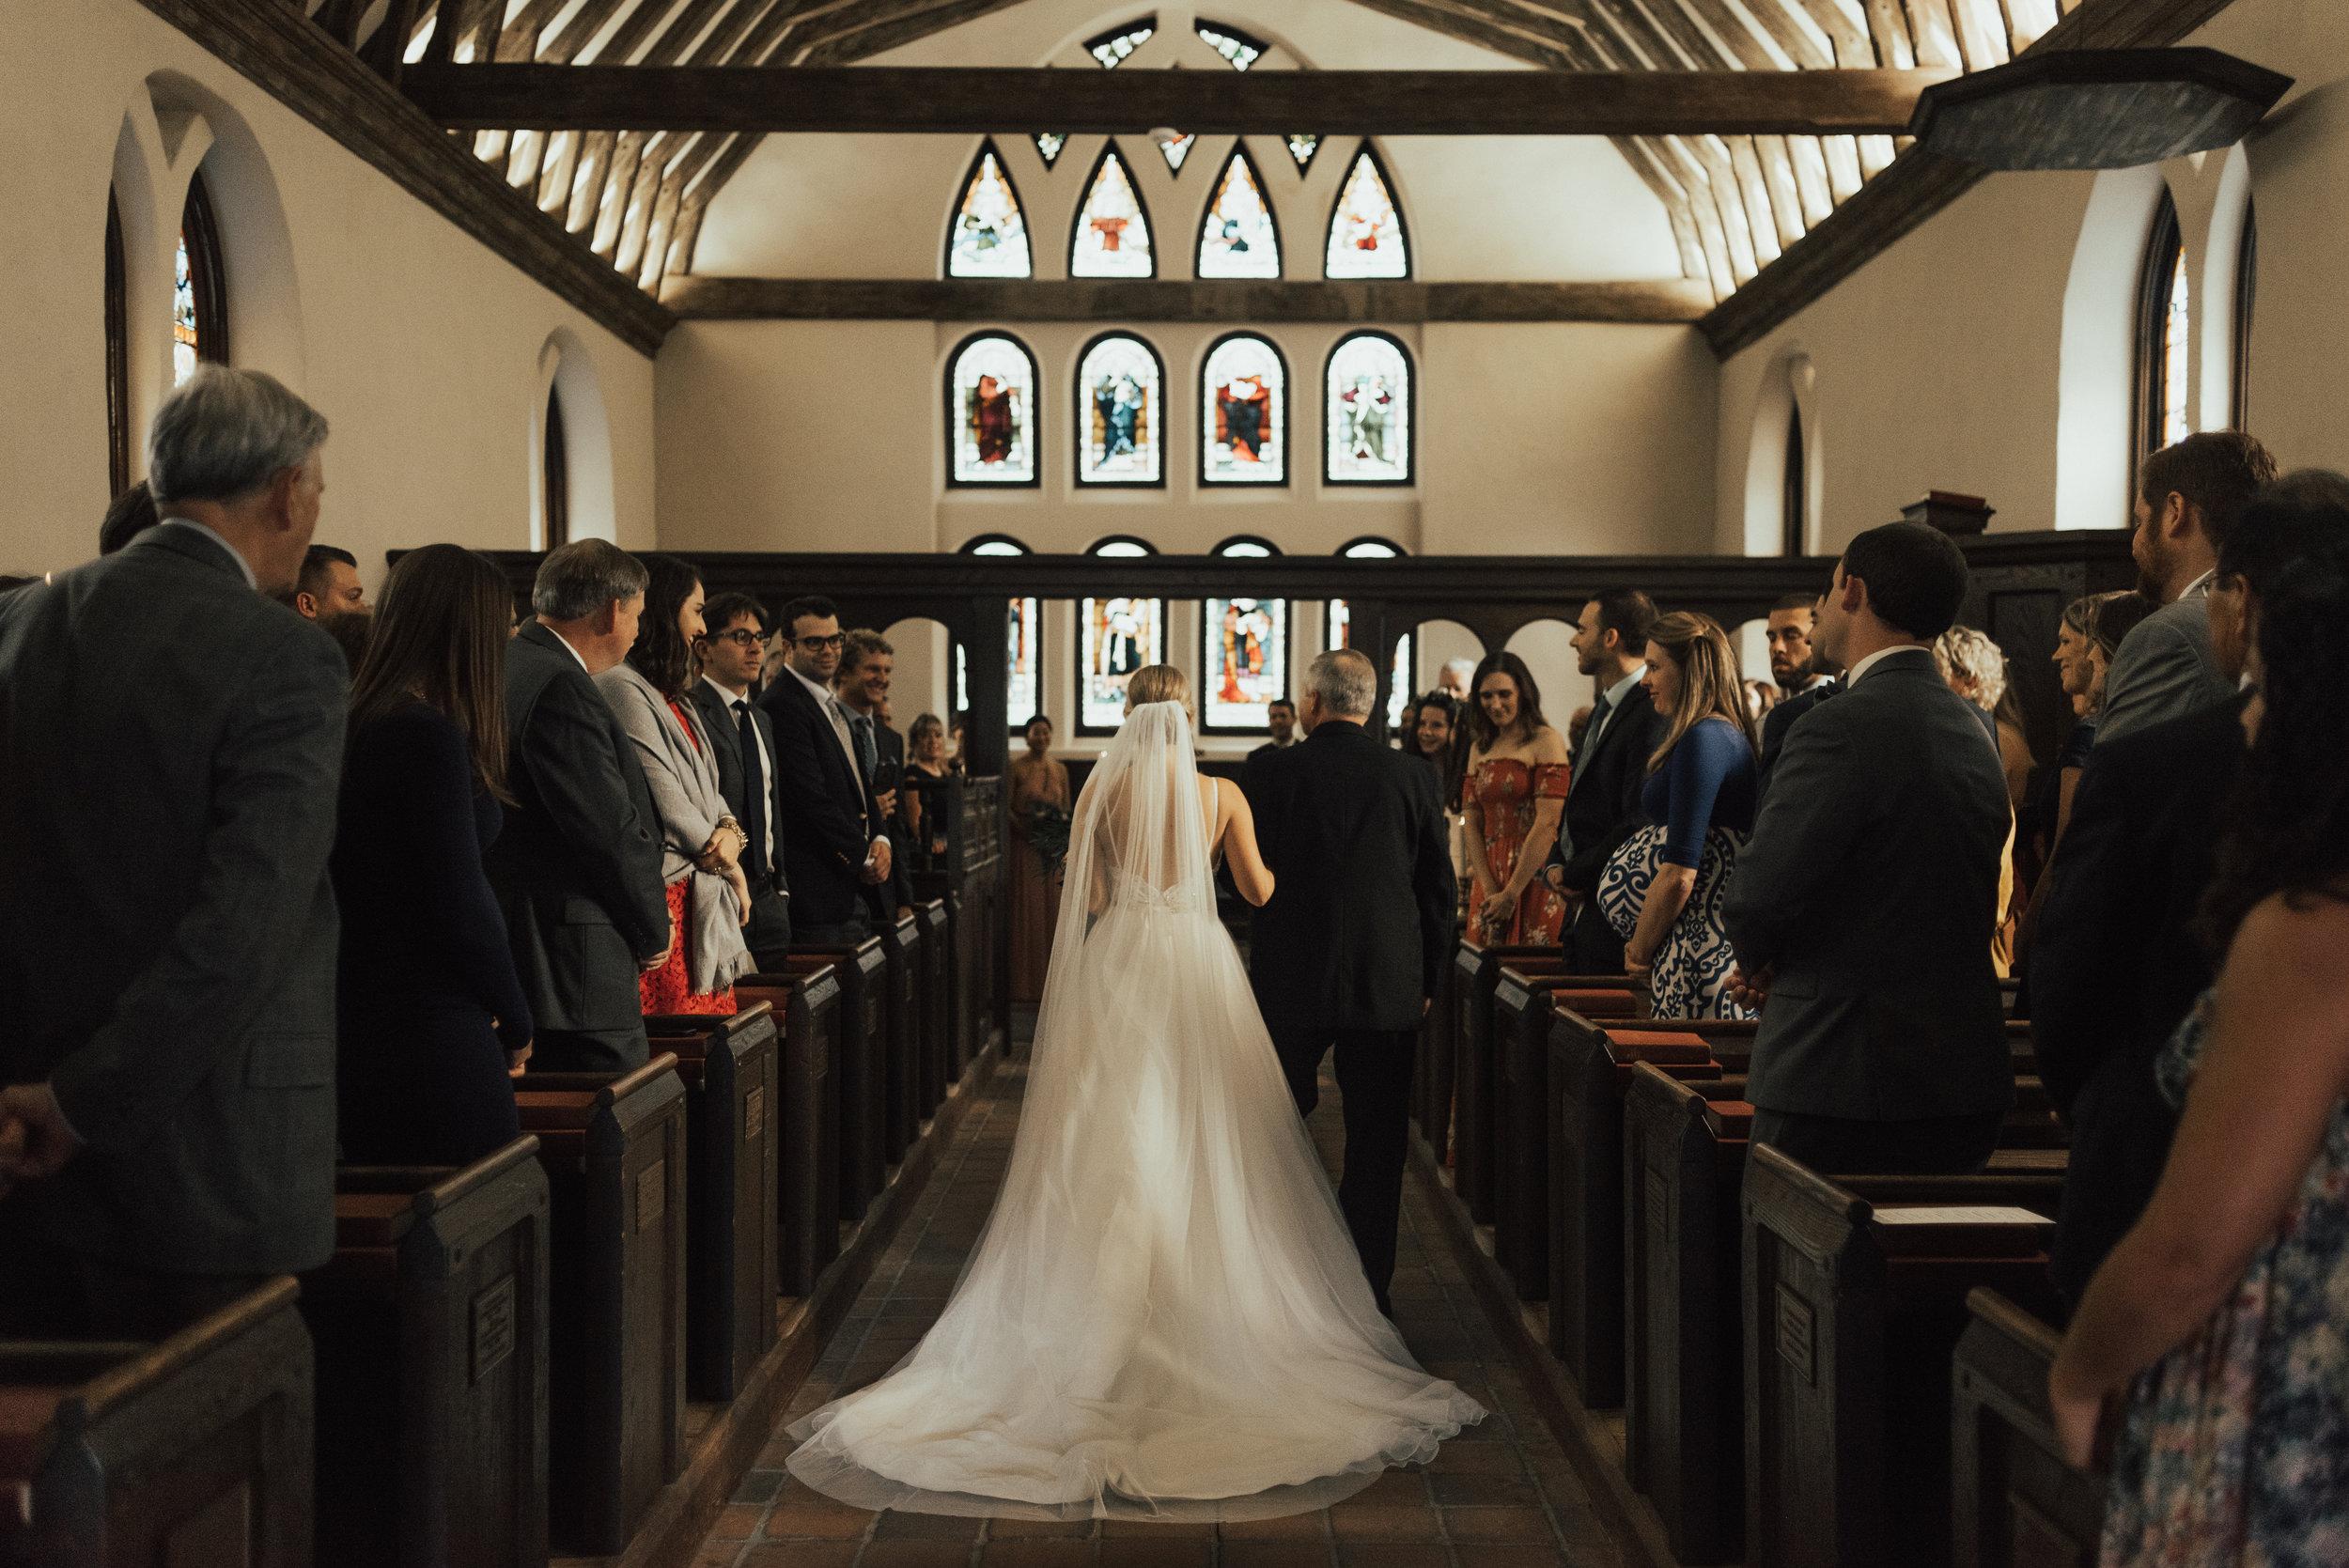 Smithfield Wedding By SB Photographs1331331331330133133133133133133133.jpg